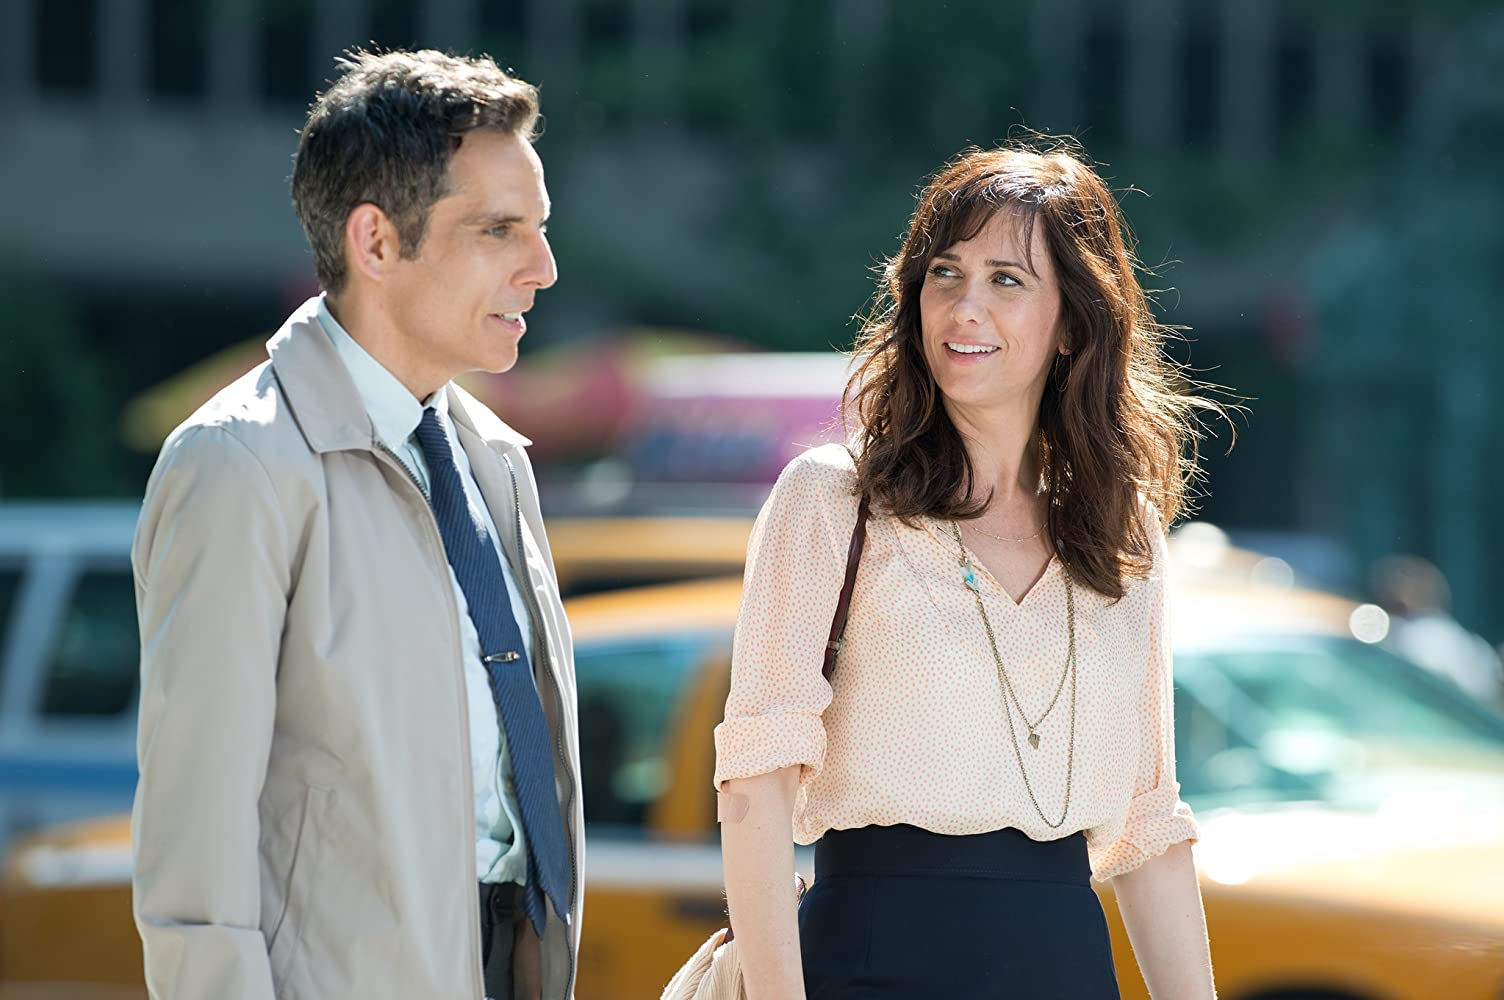 Ben Stiller and Kristen Wiig in The Secret Life of Walter Mitty (2013)